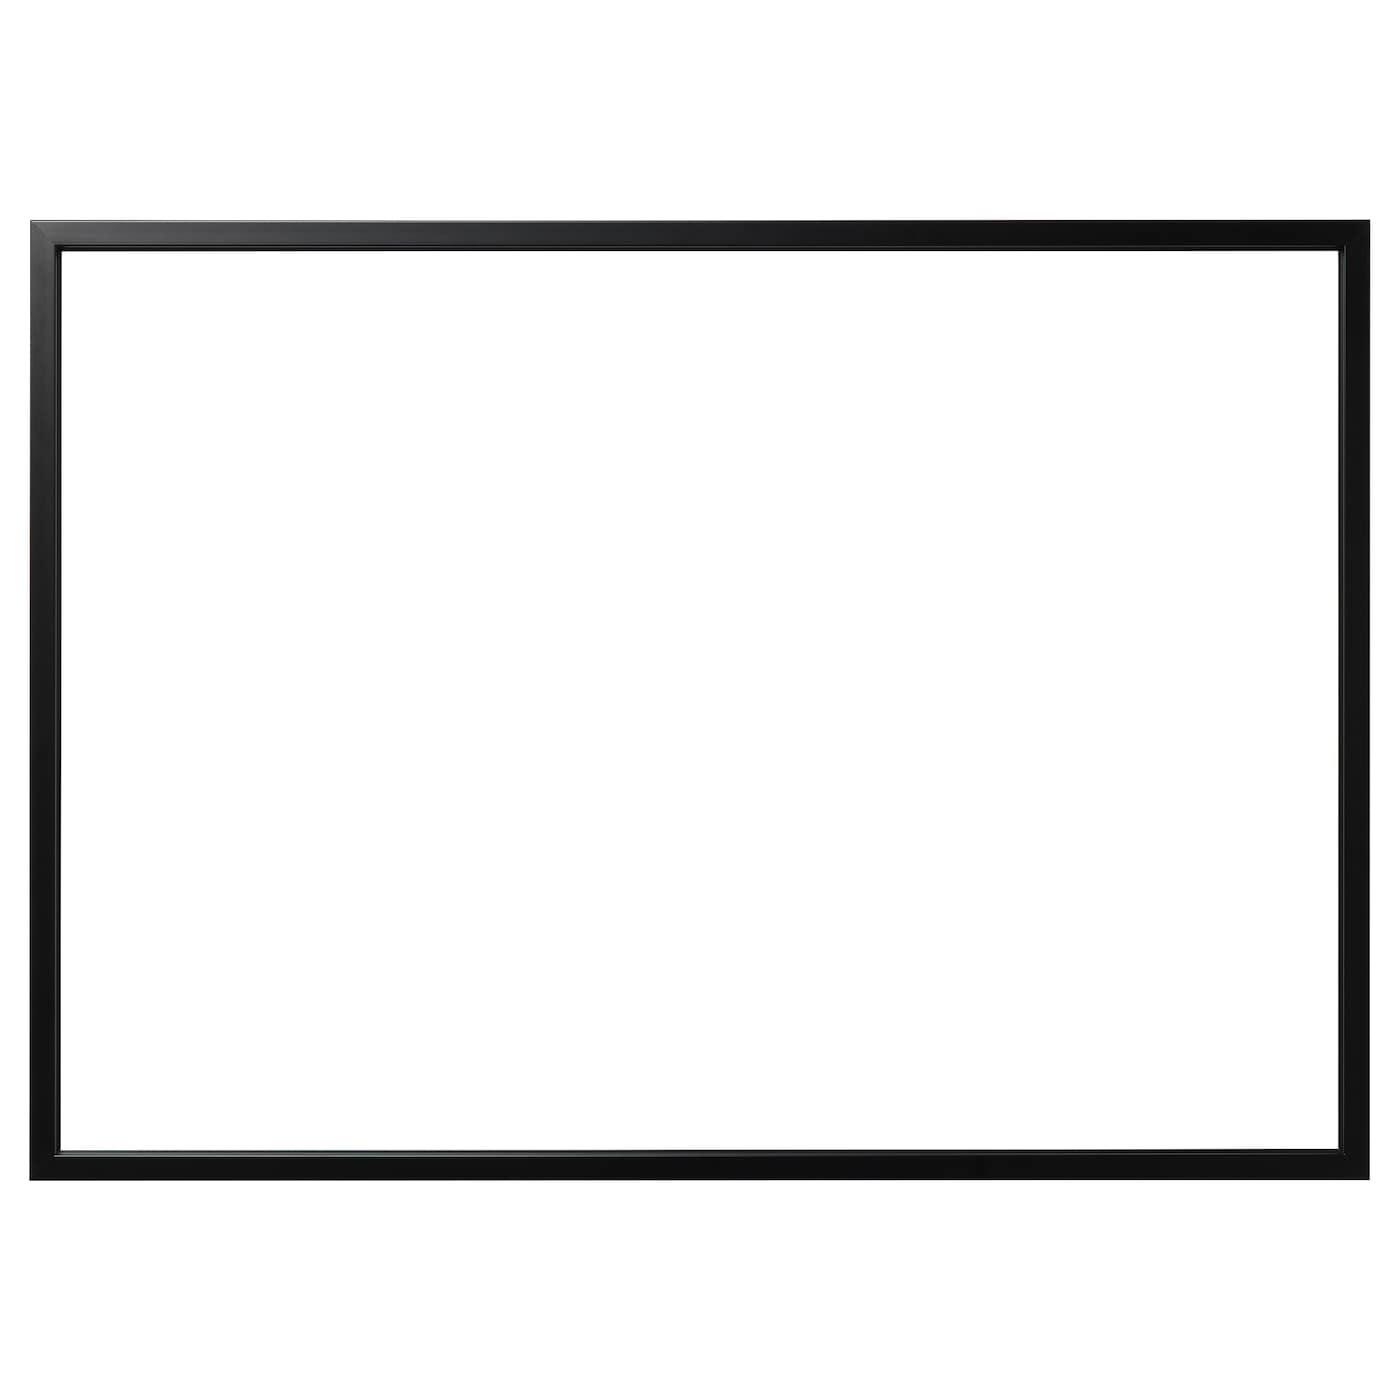 bjÖrksta frame black 140x100 cm - ikea